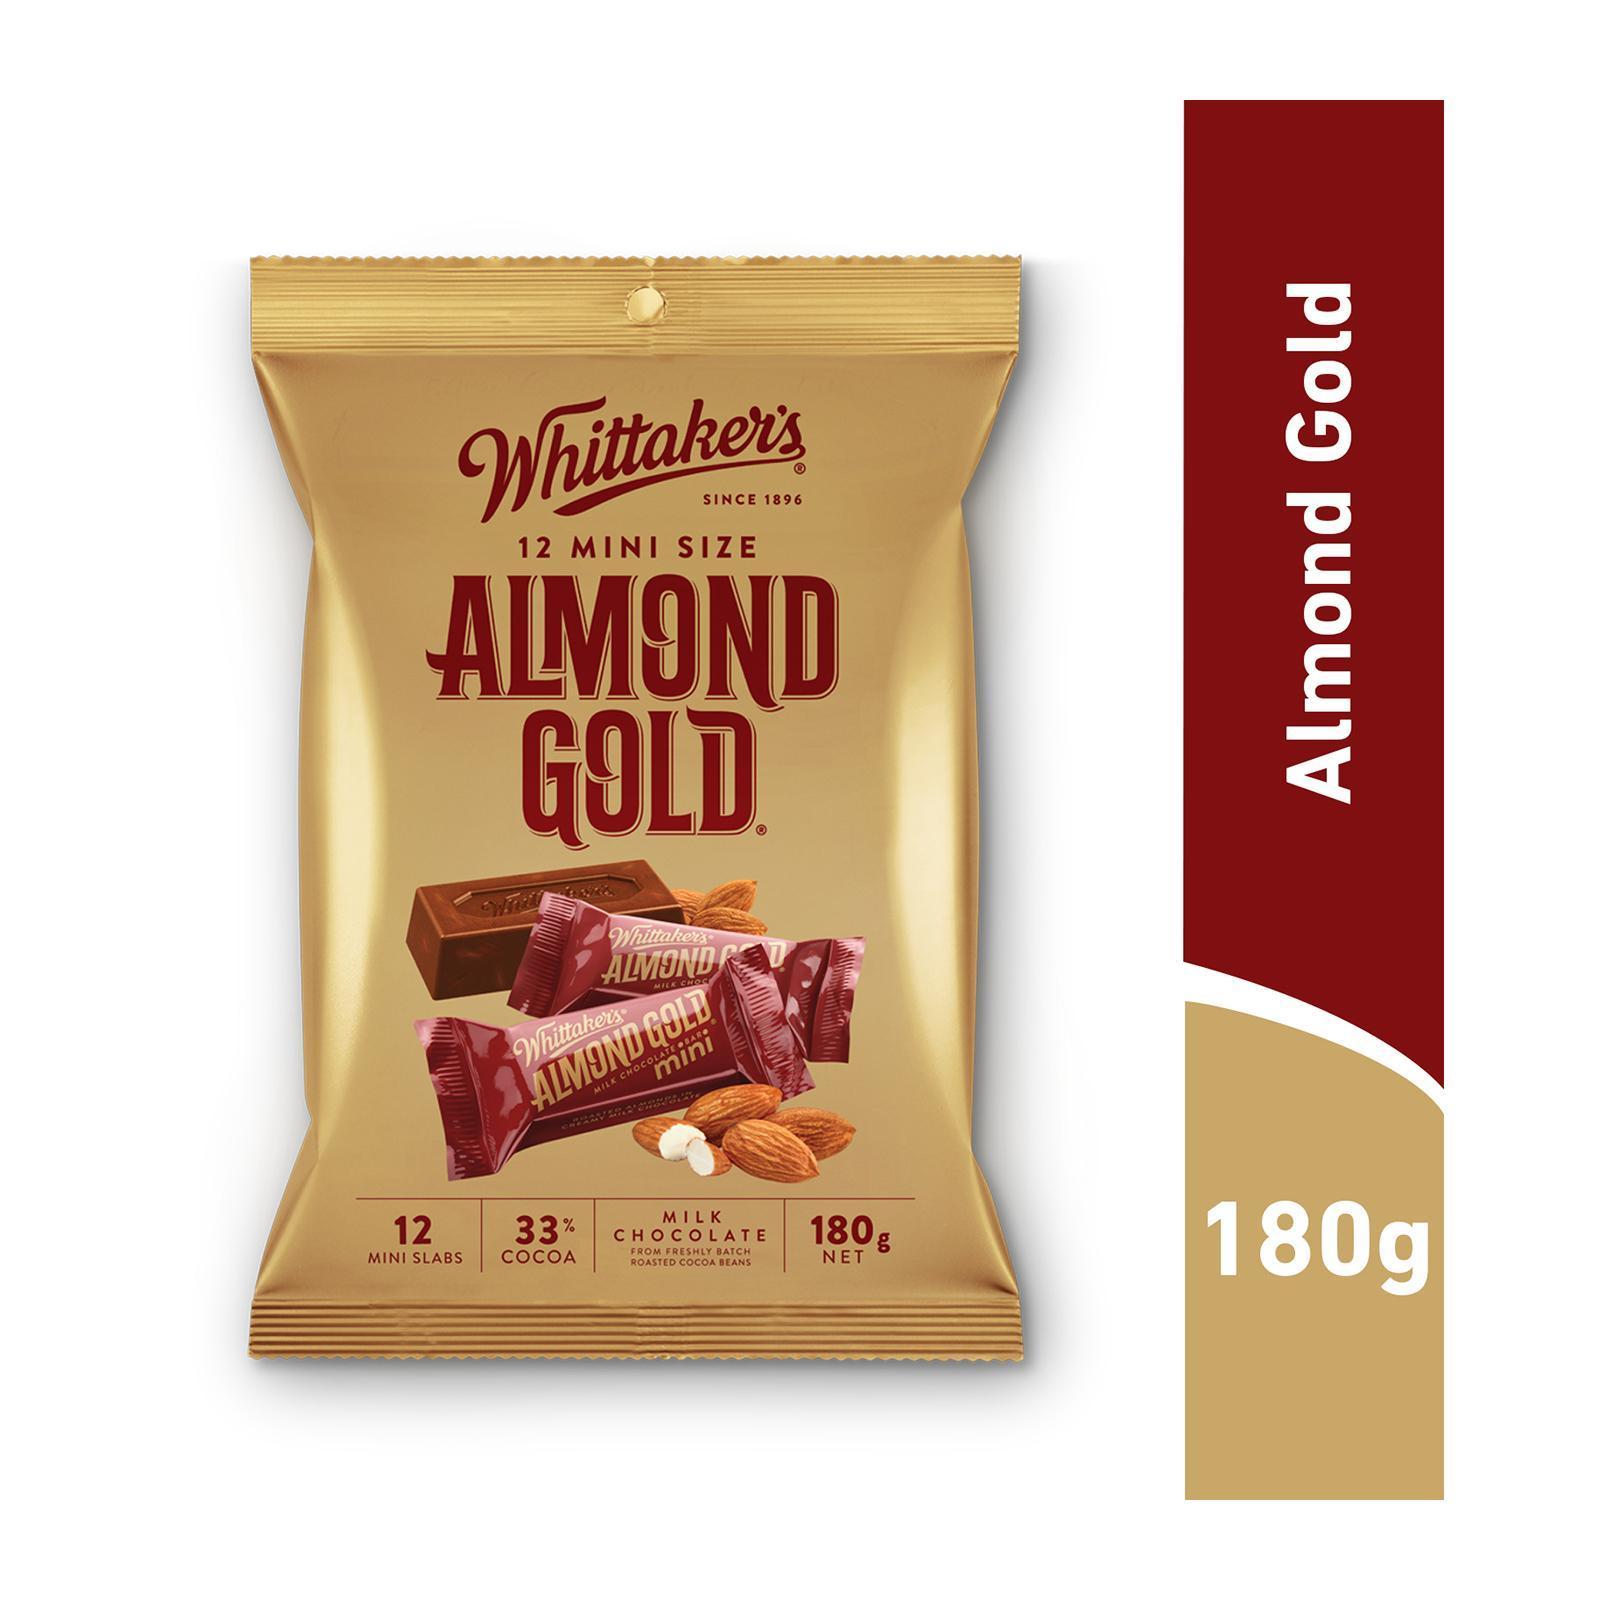 WHITTAKER'S Mini Milk Chocolate - Almond Gold 12s